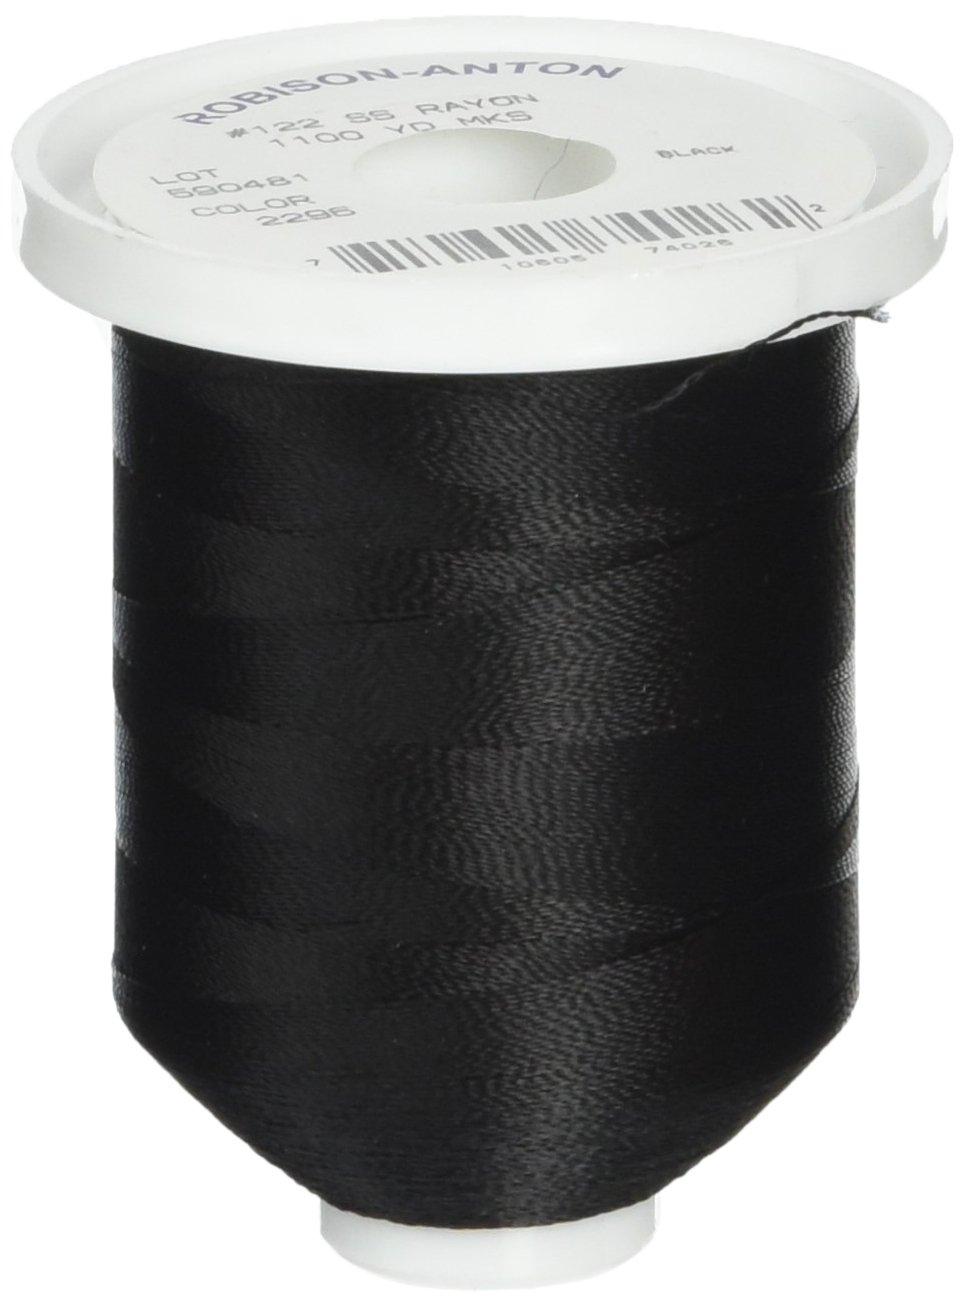 Robison-Anton Rayon Super Strength Thread, Solid Colors, 1100-Yard, Black AMERICAN & EFIRD 300S-2296